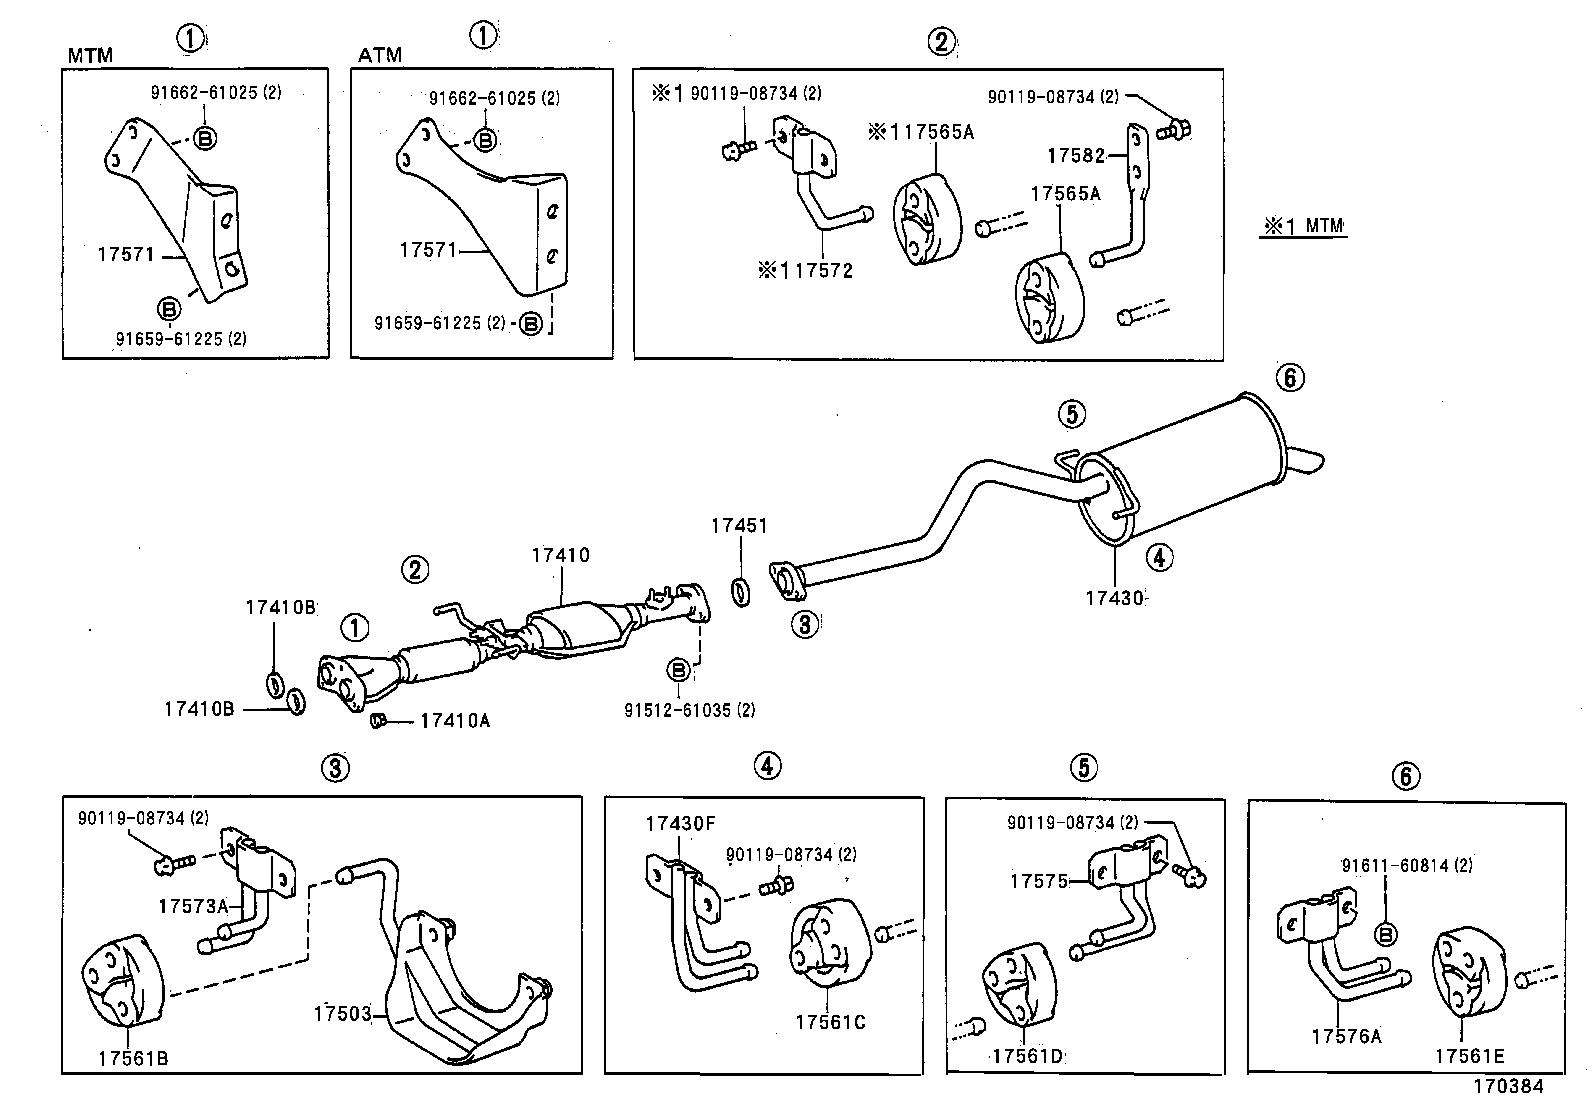 toyota previatcr10r-rrsdkq - tool-engine-fuel